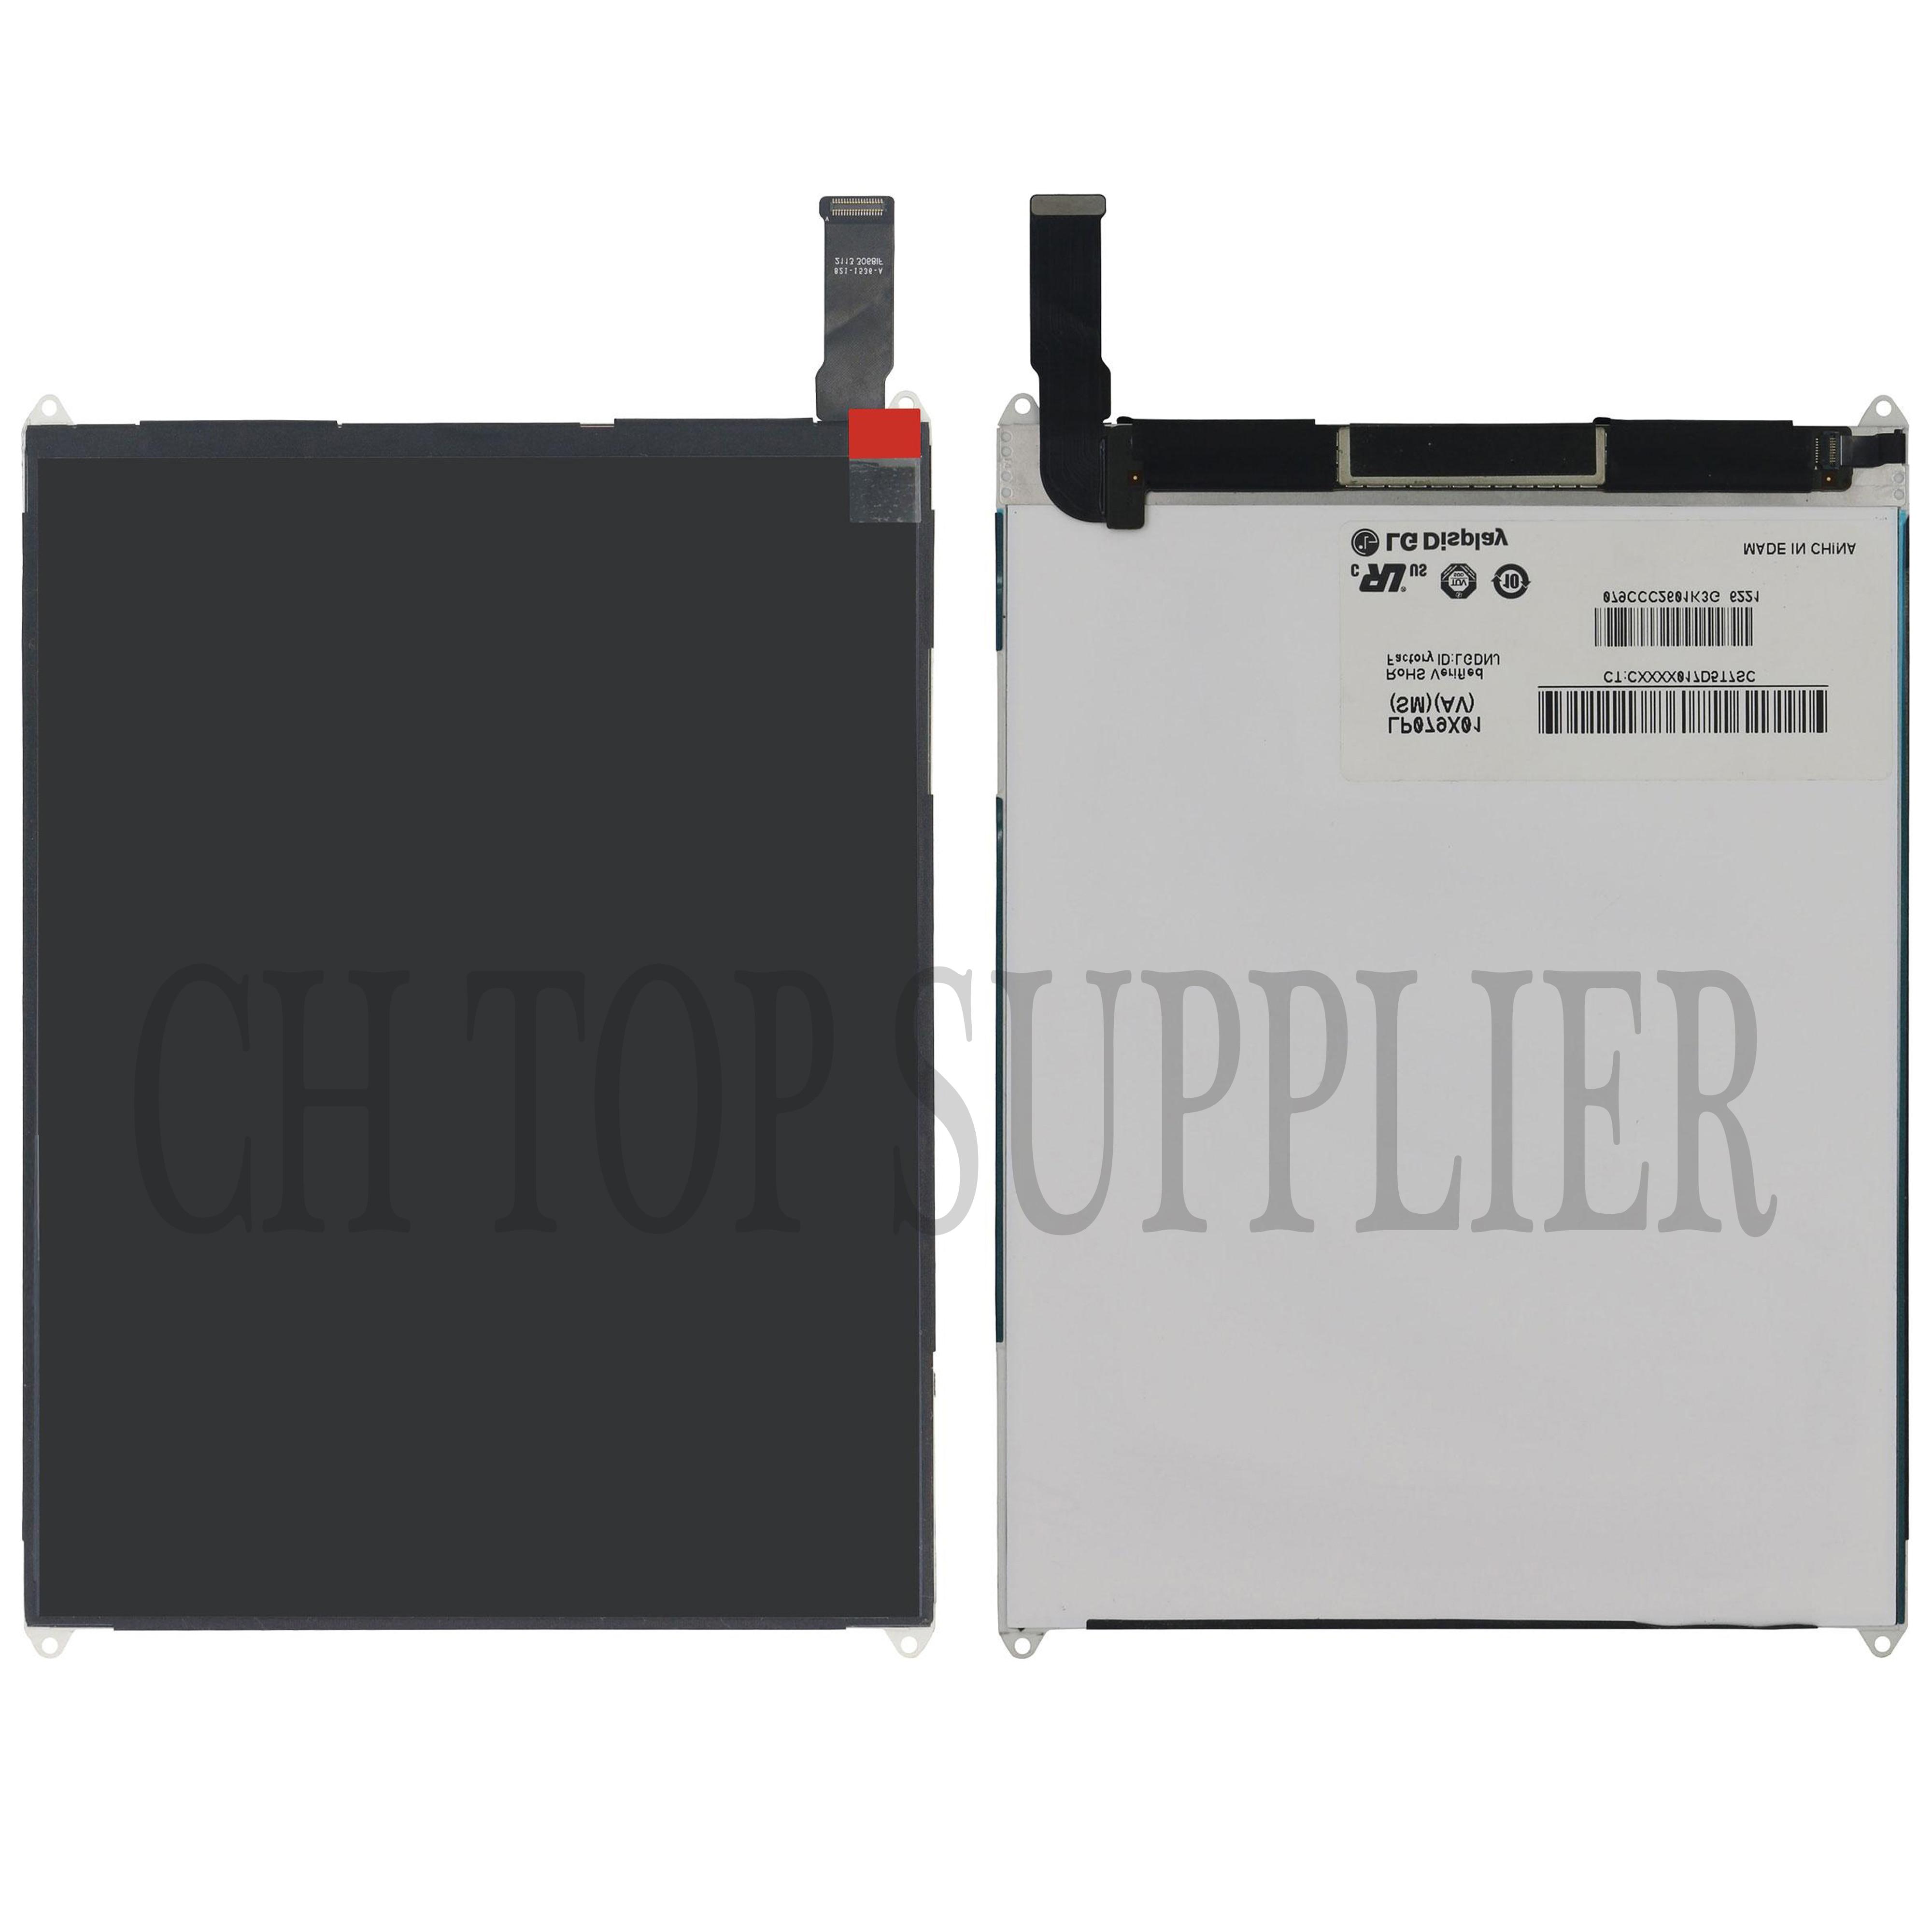 Original and New LCD screen 646-0911-AP2-A 069-8634-A 821-1536-A for cube talk79 U35GT U55GT tablet pc display screen LCD screen<br>